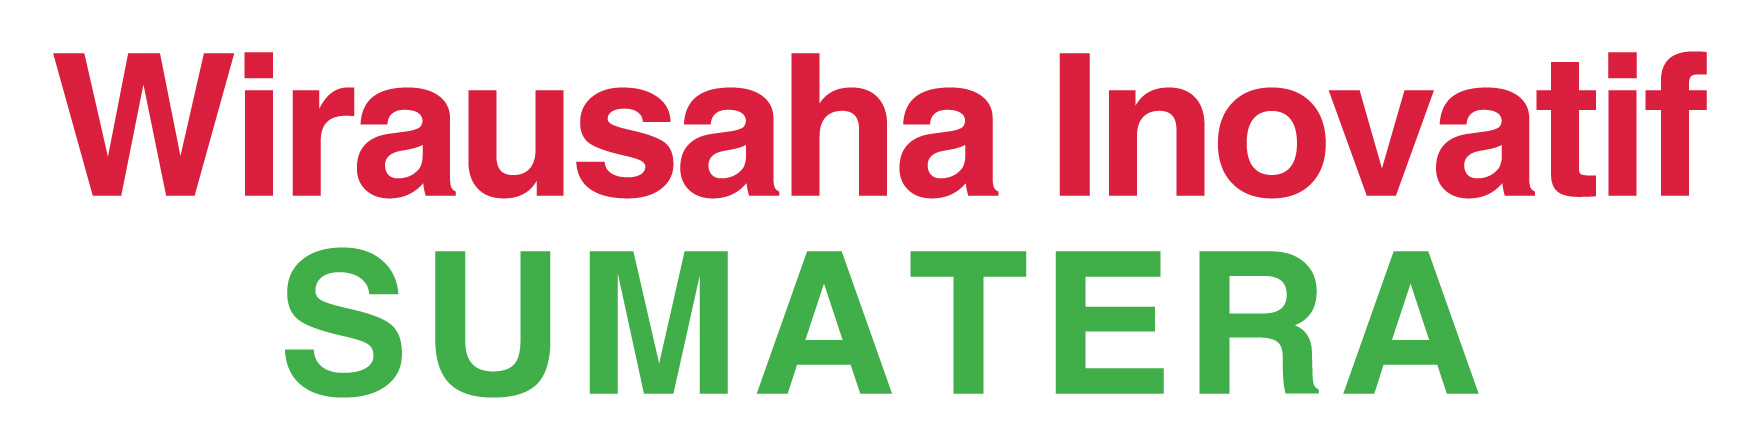 logo-WI-Sumatera